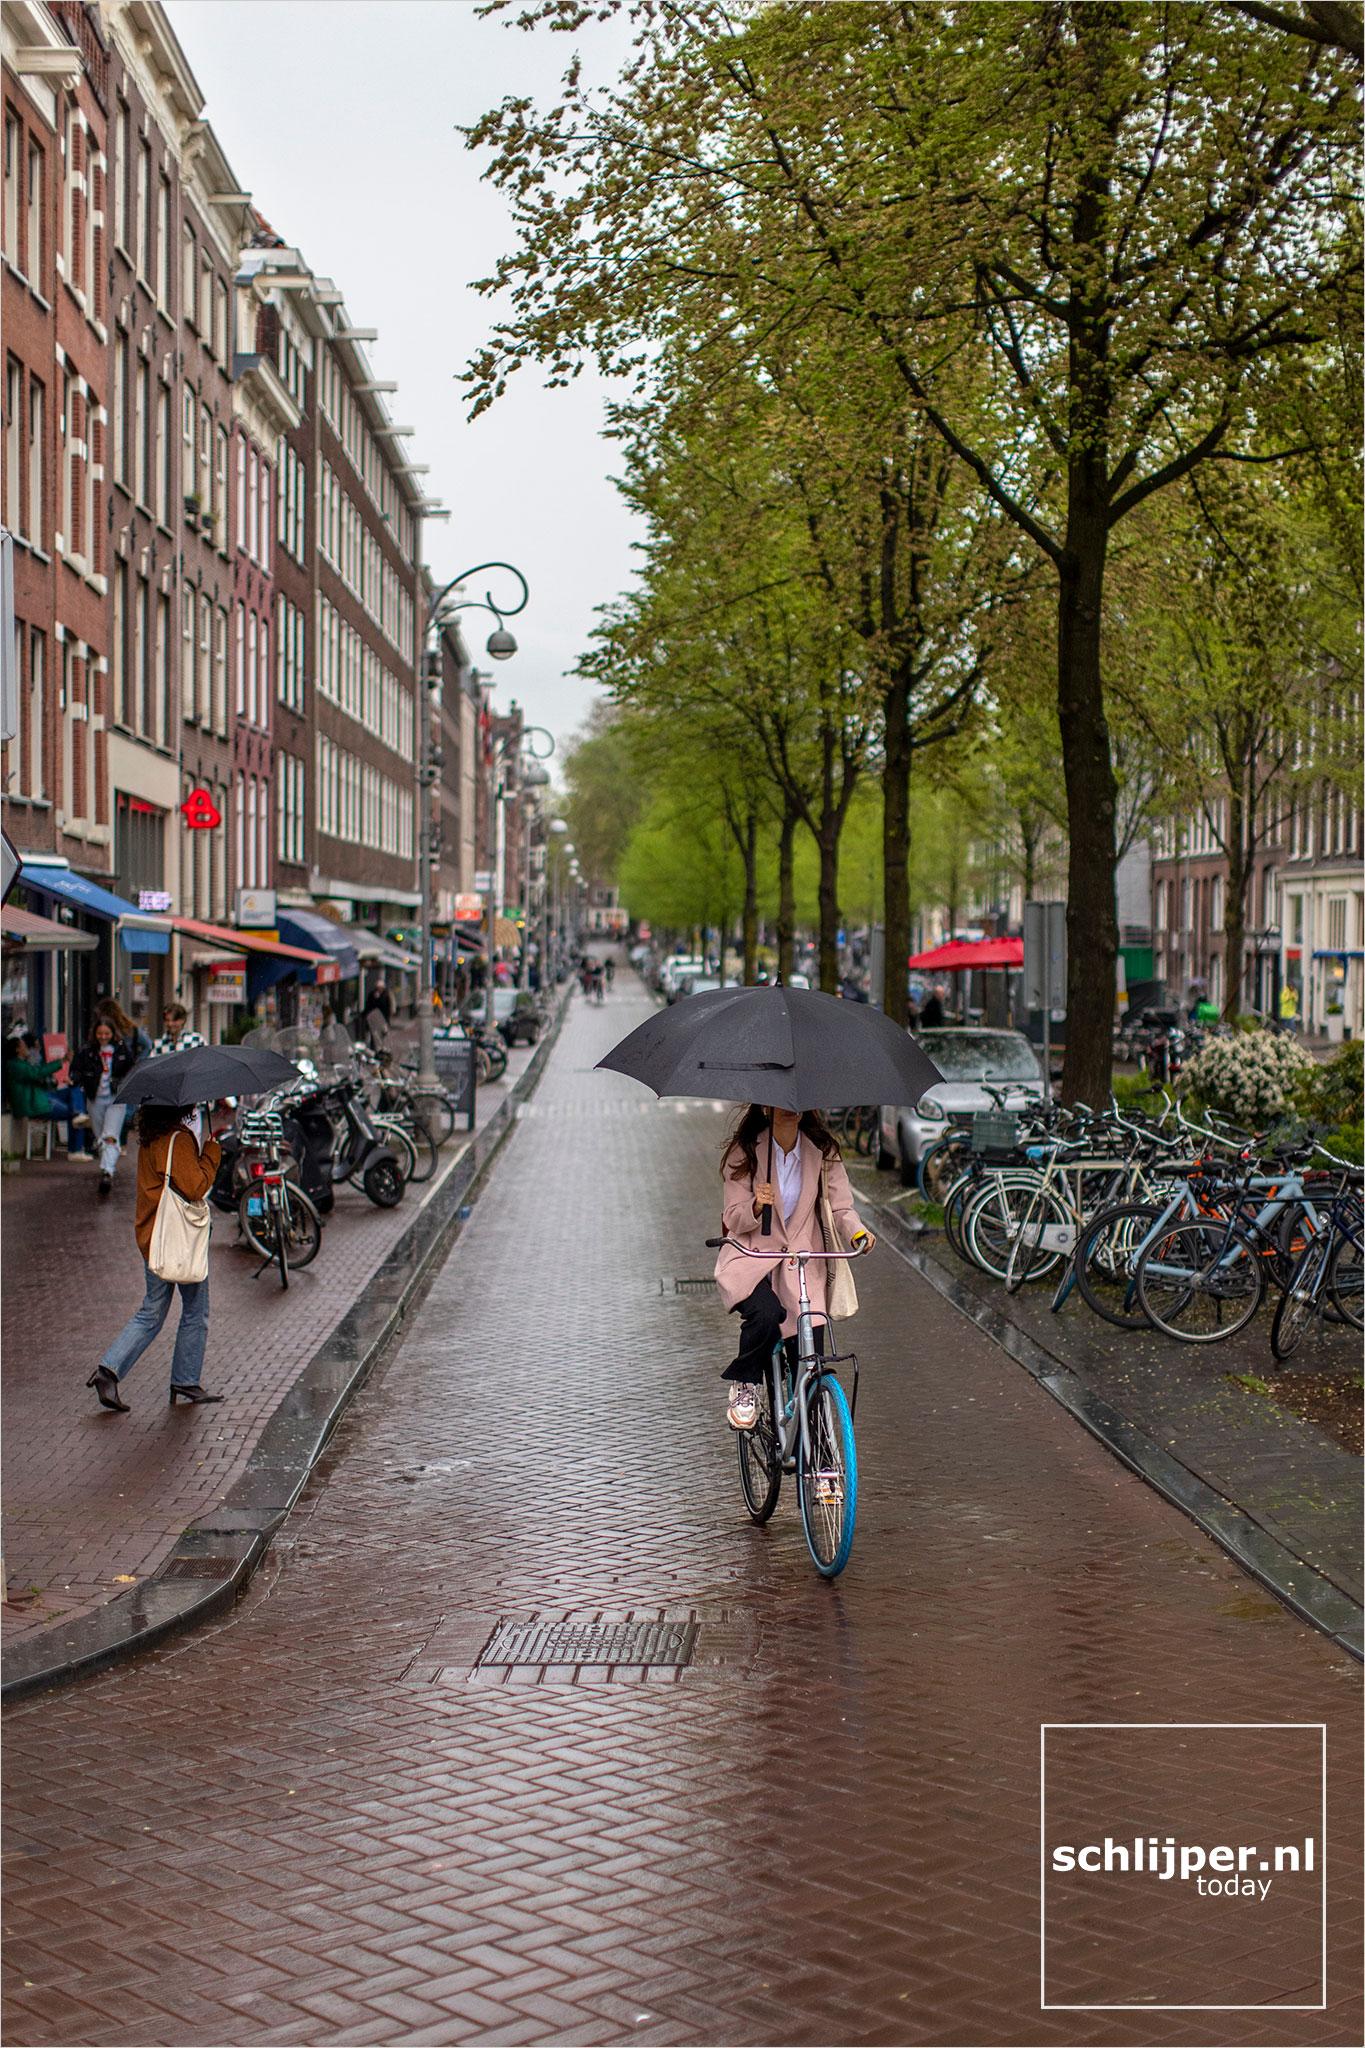 The Netherlands, Amsterdam, 11 mei 2021